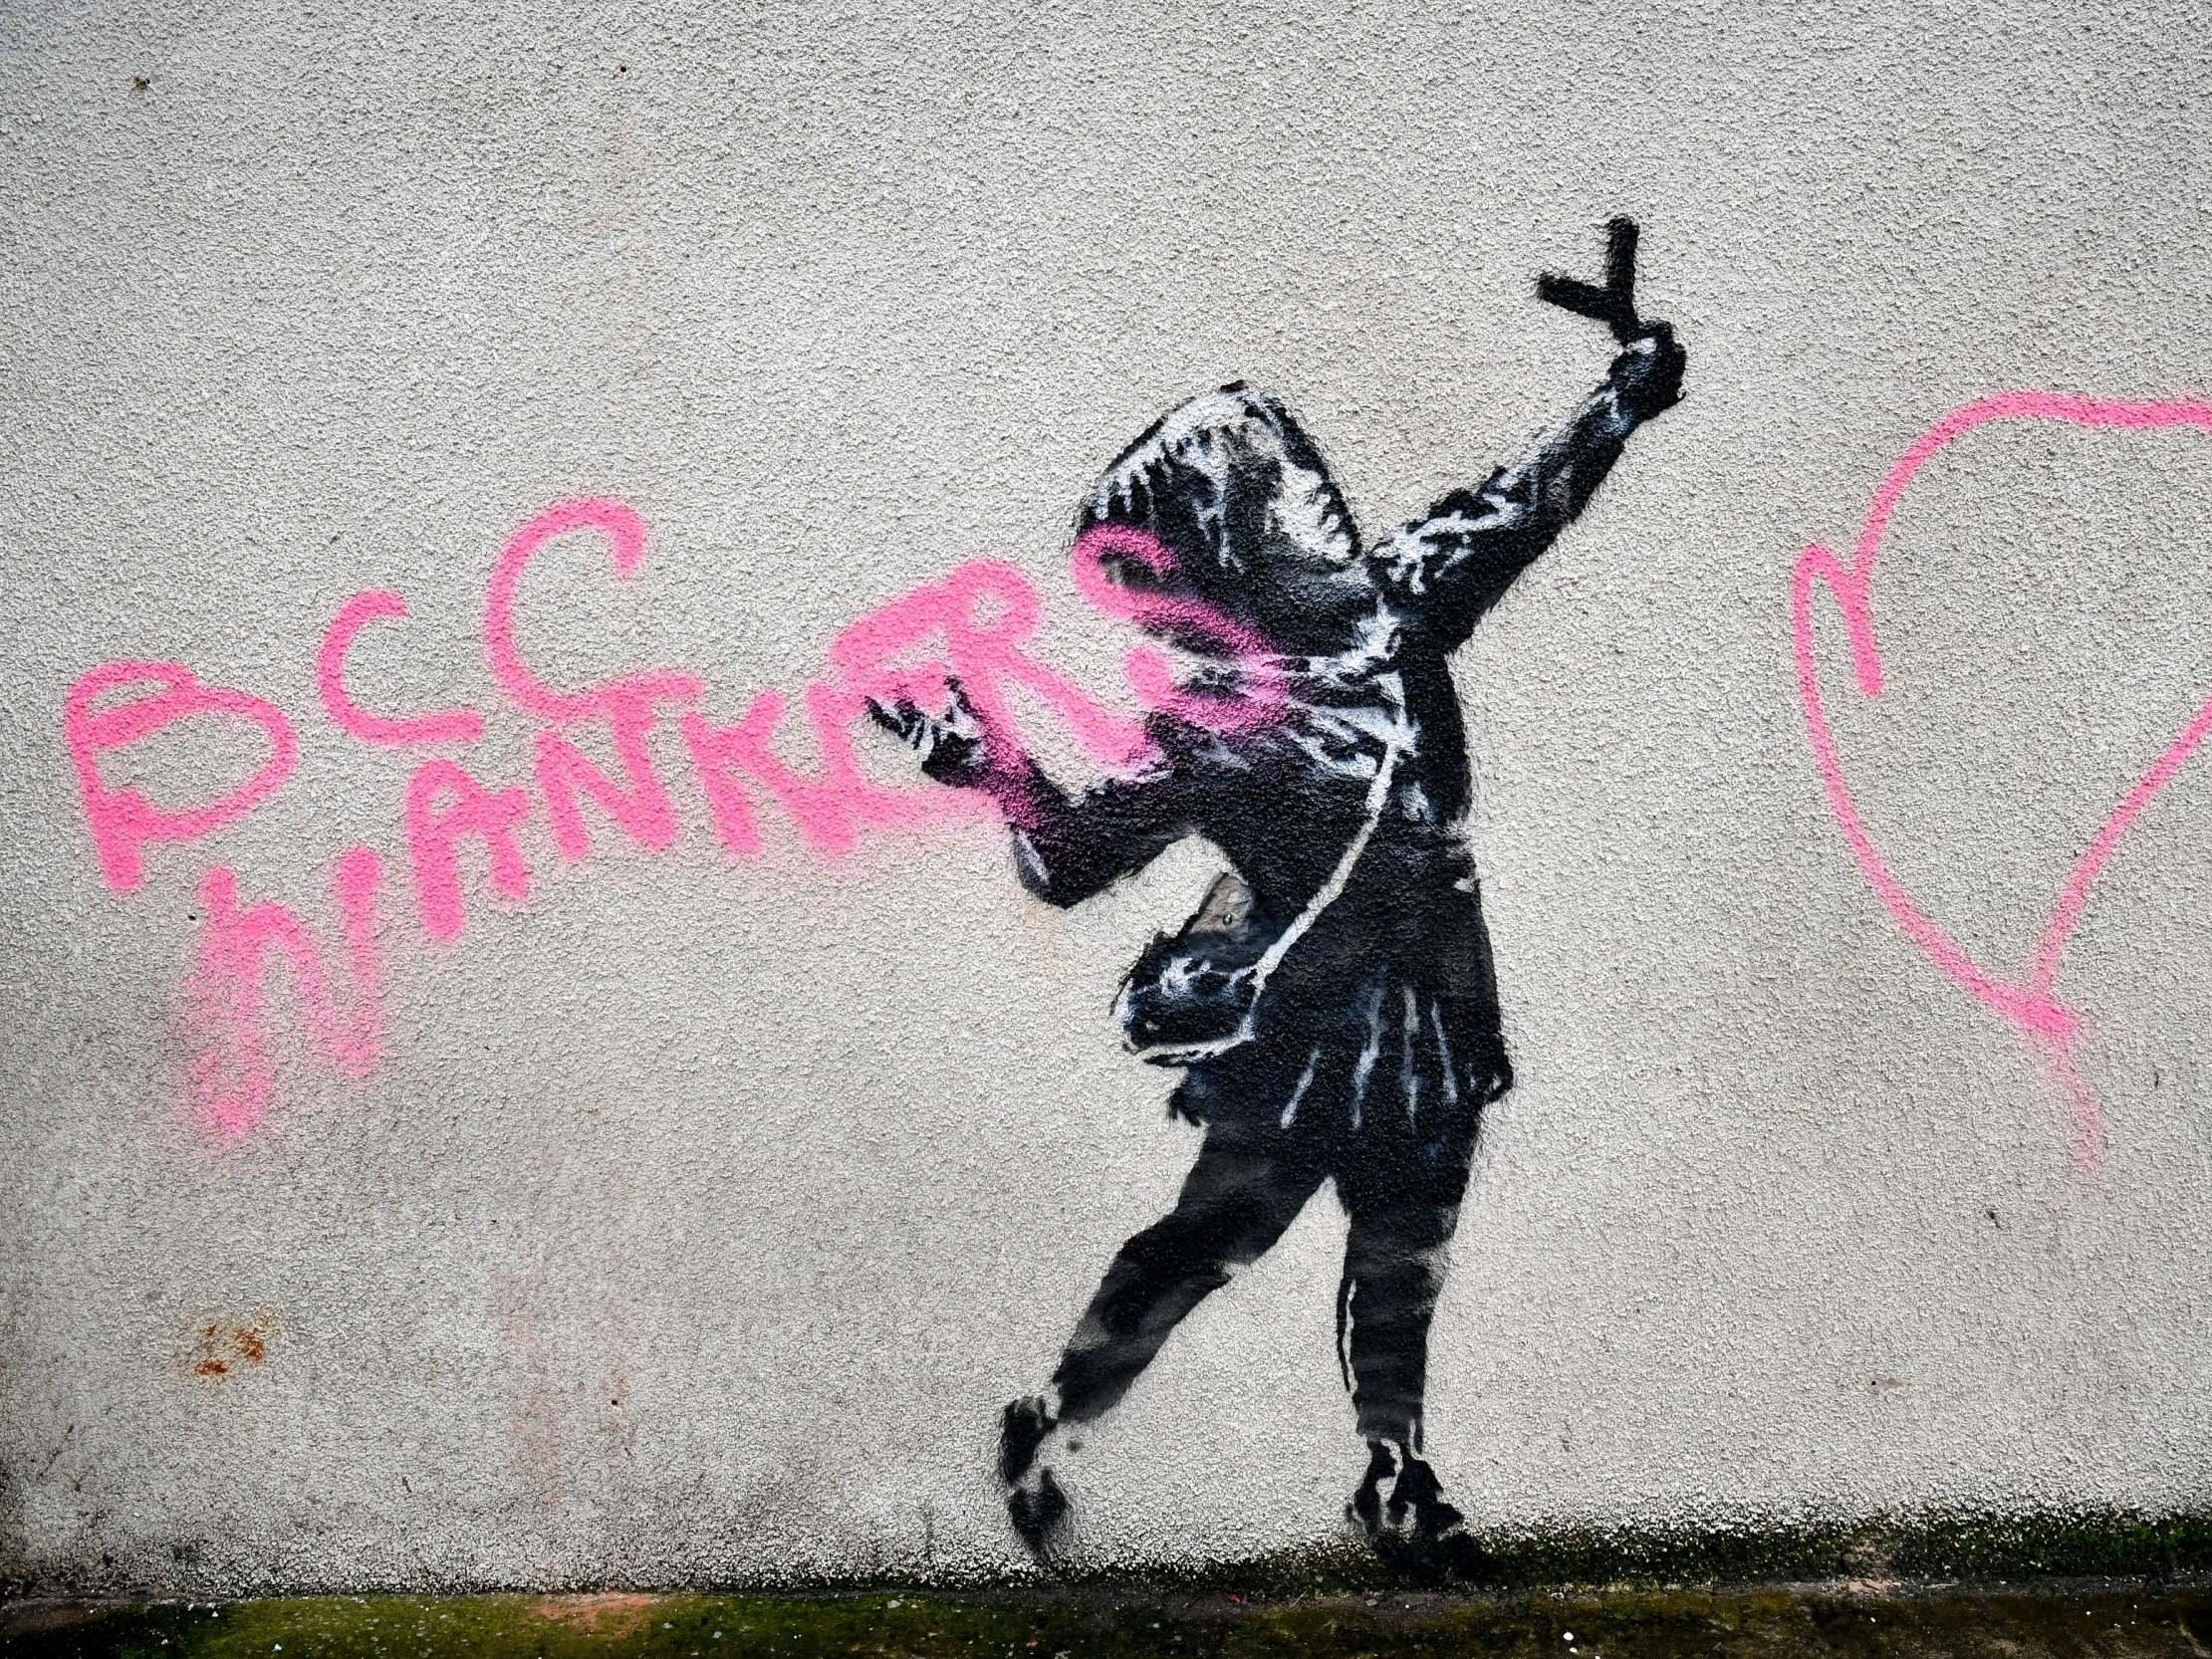 Banksy says he is 'glad' his latest work has been vandalised